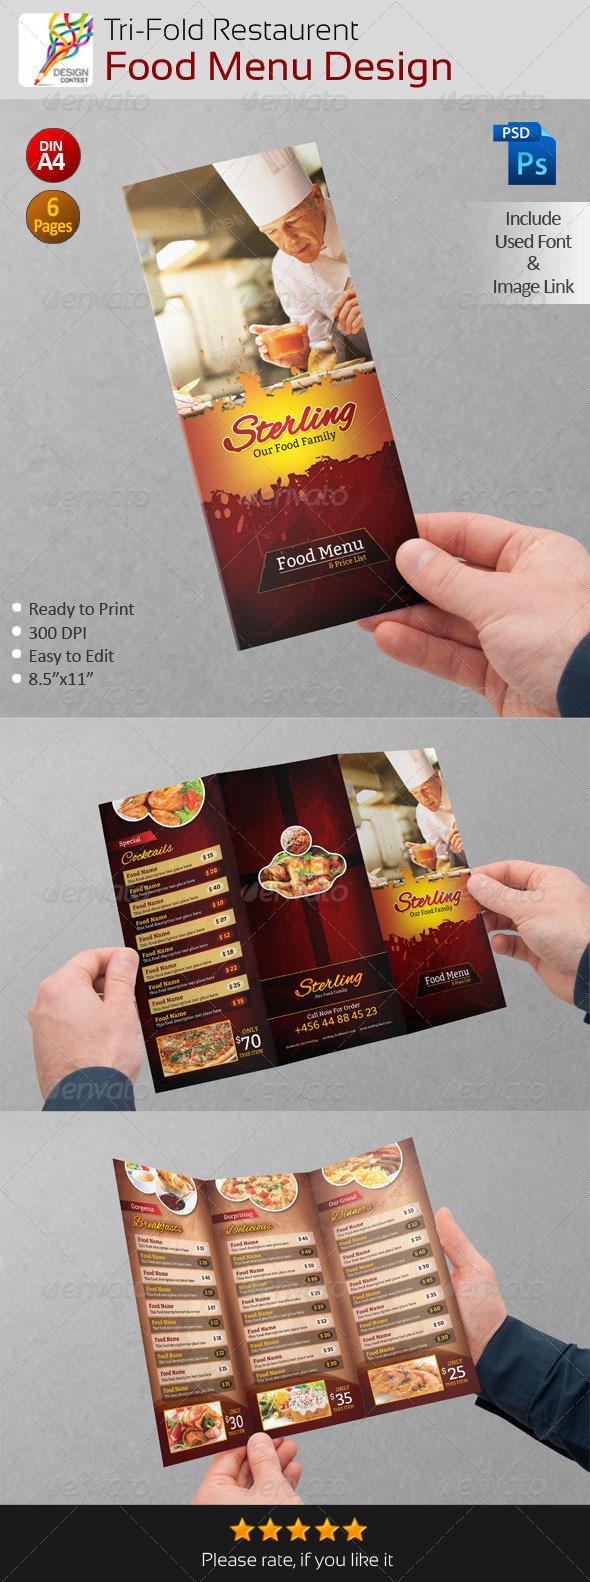 creative restaurent tri fold food menu design by contestdesign graphicriver. Black Bedroom Furniture Sets. Home Design Ideas